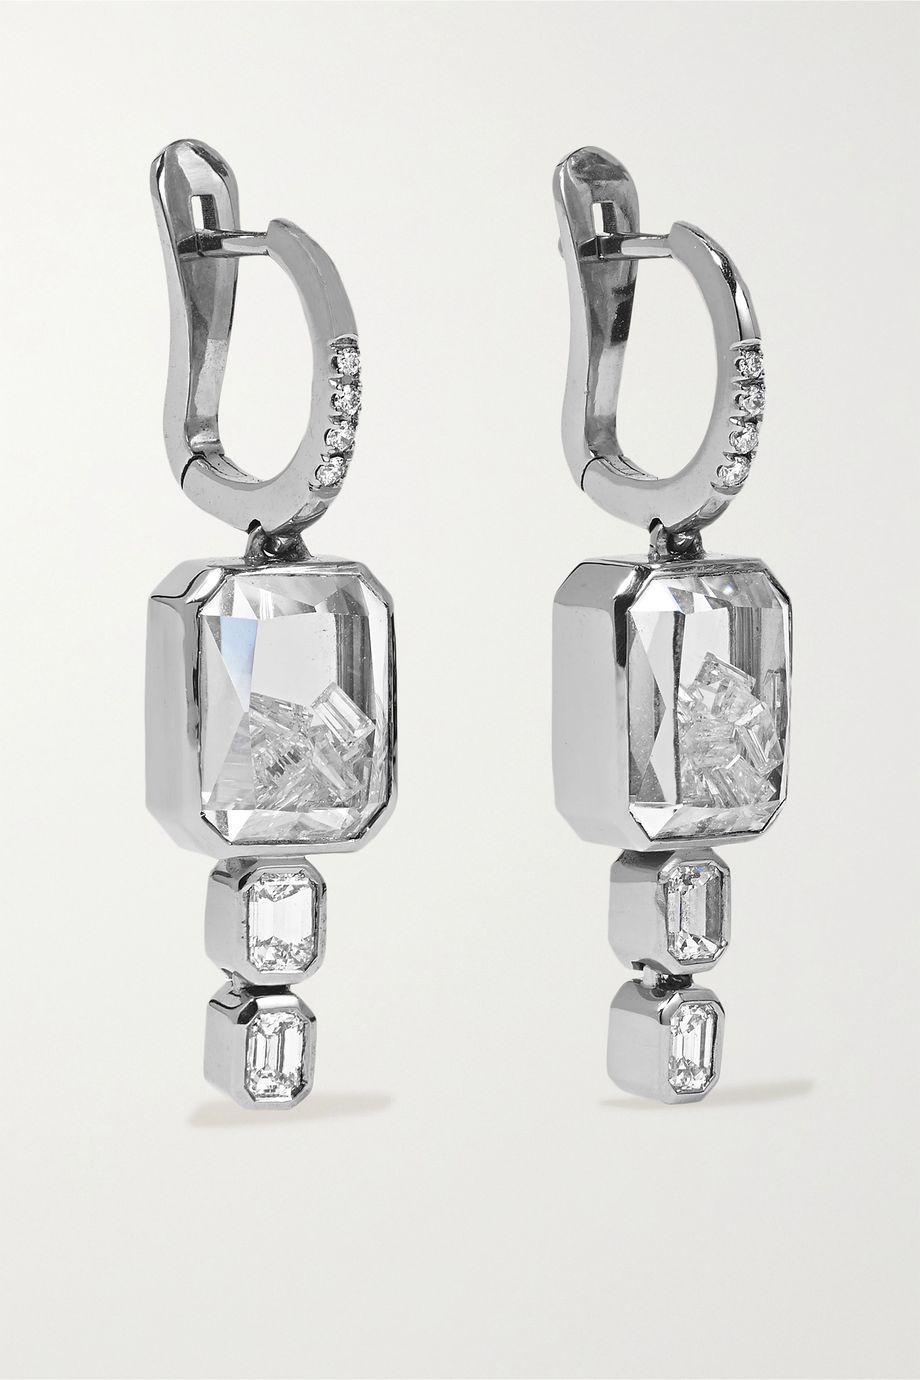 Moritz Glik 18-karat gray gold palladium, enamel, sapphire crystal and diamond earrings